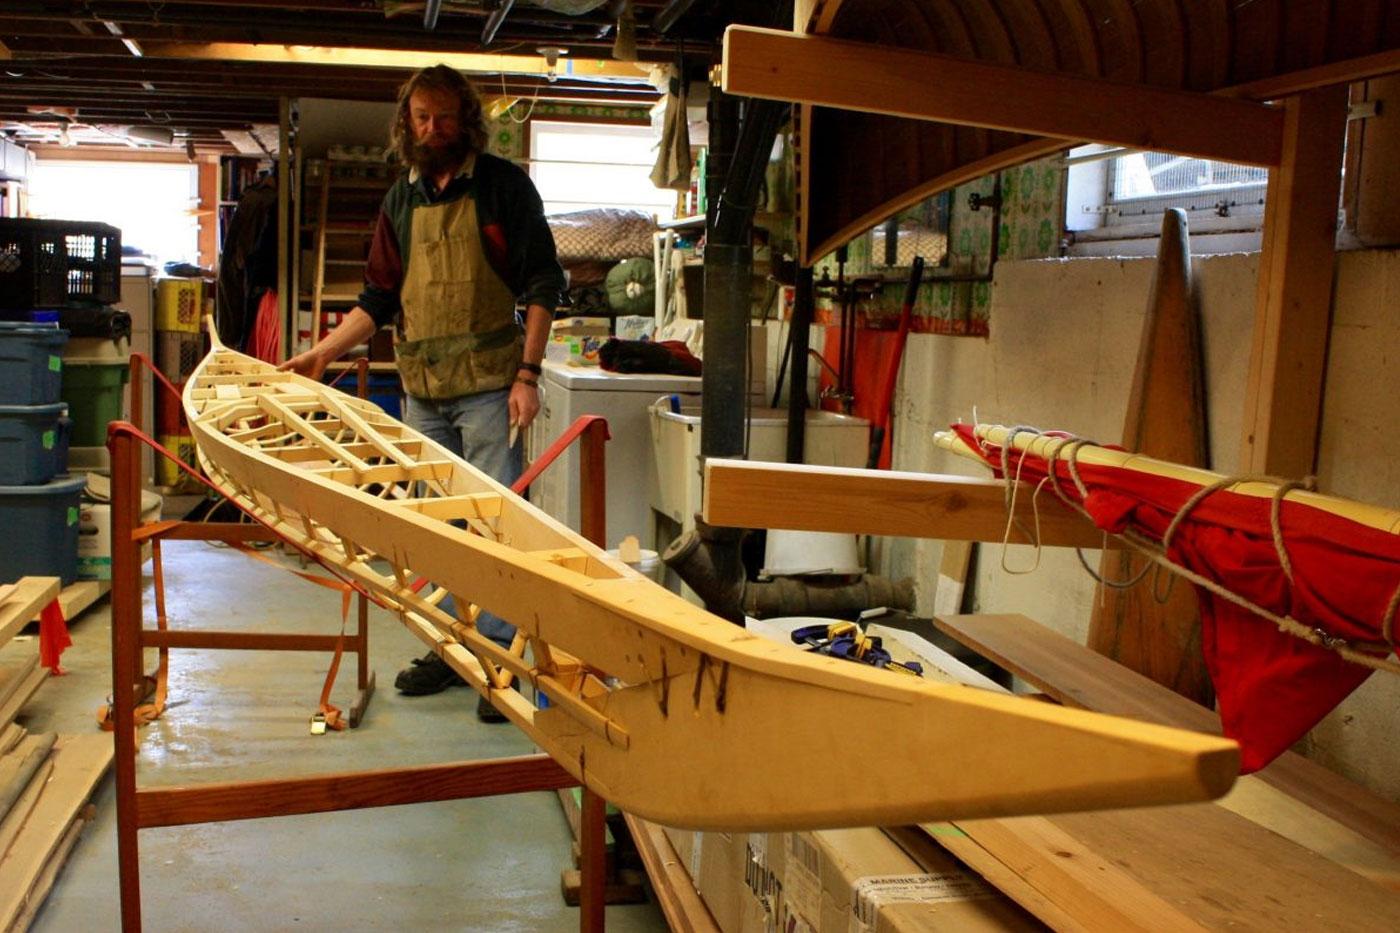 Hinderloopen Greenland kayak frame